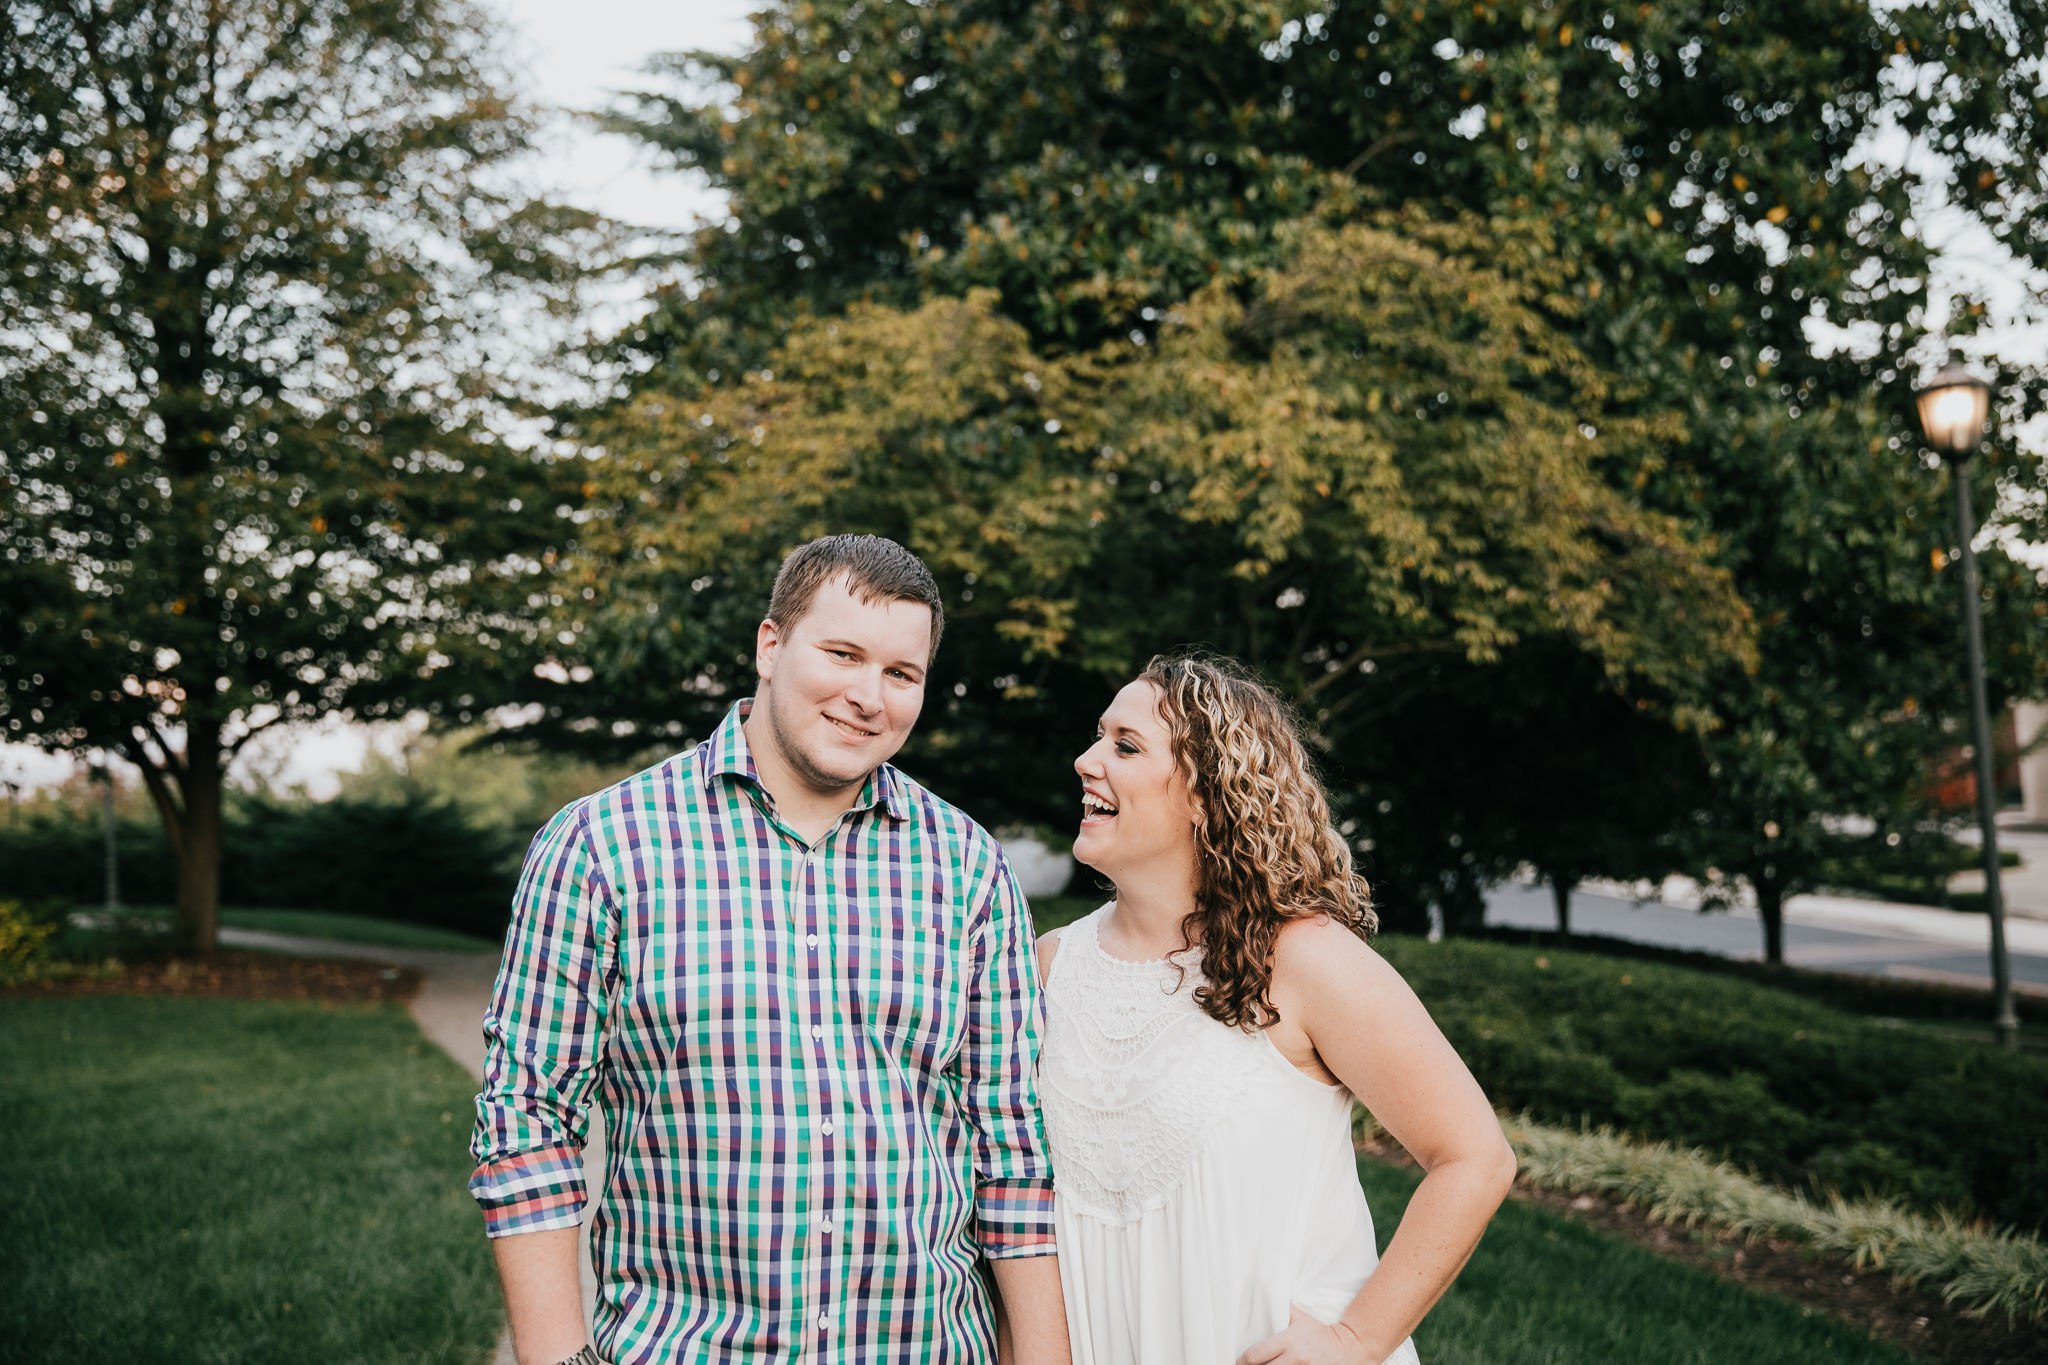 Roanoke - Engagement- Virginia wedding photographer - Pat Cori Photography-18.jpg